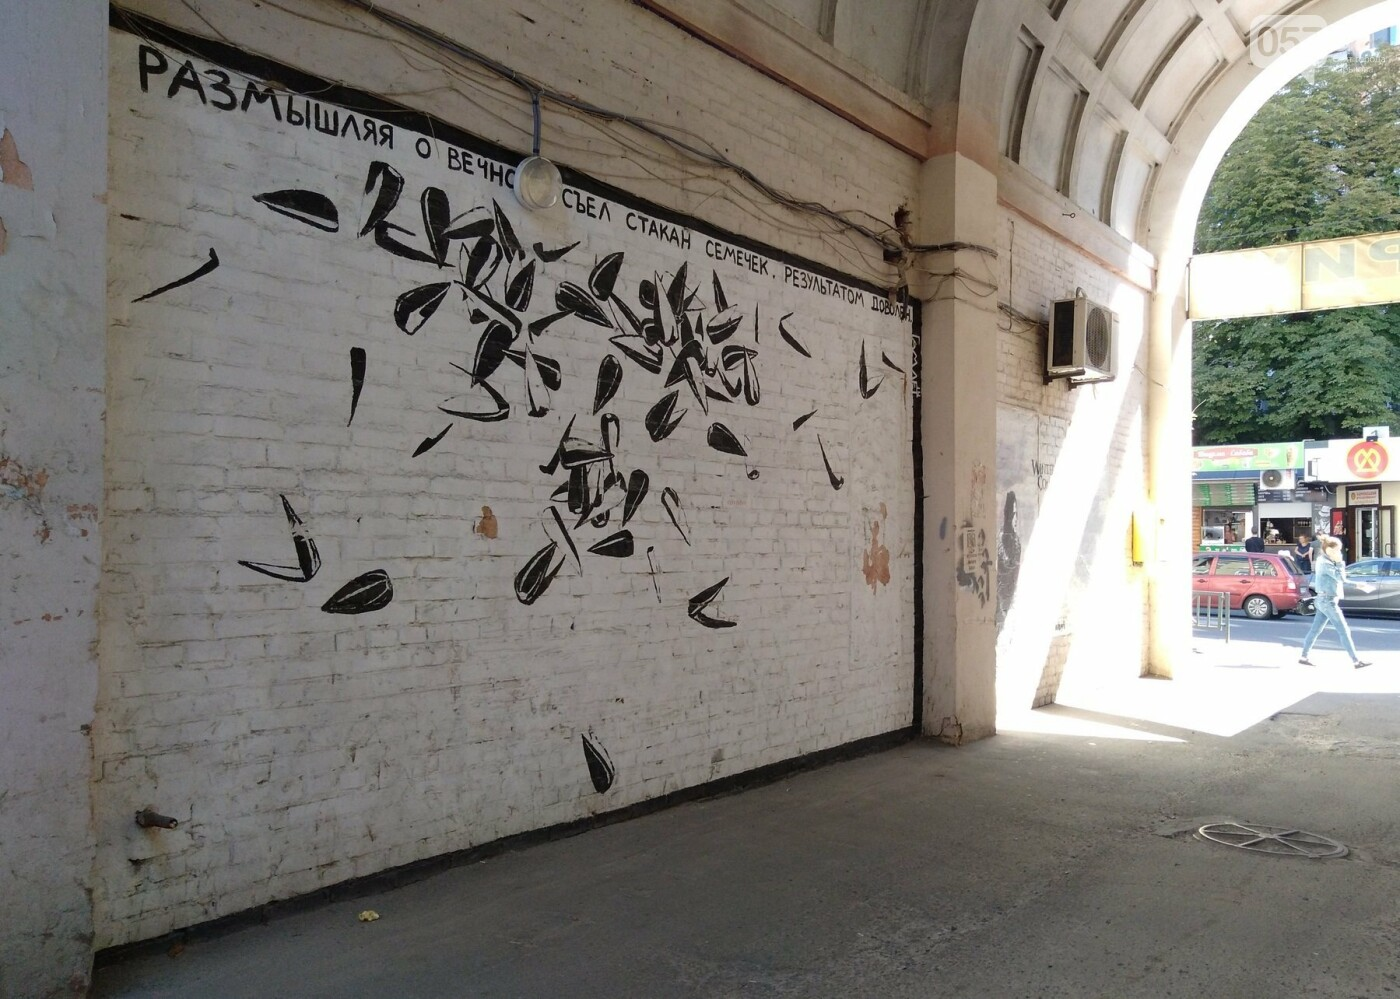 Стрит-арт Гамлета в Харькове: ТОП-10 граффити художника, - ФОТО, фото-27